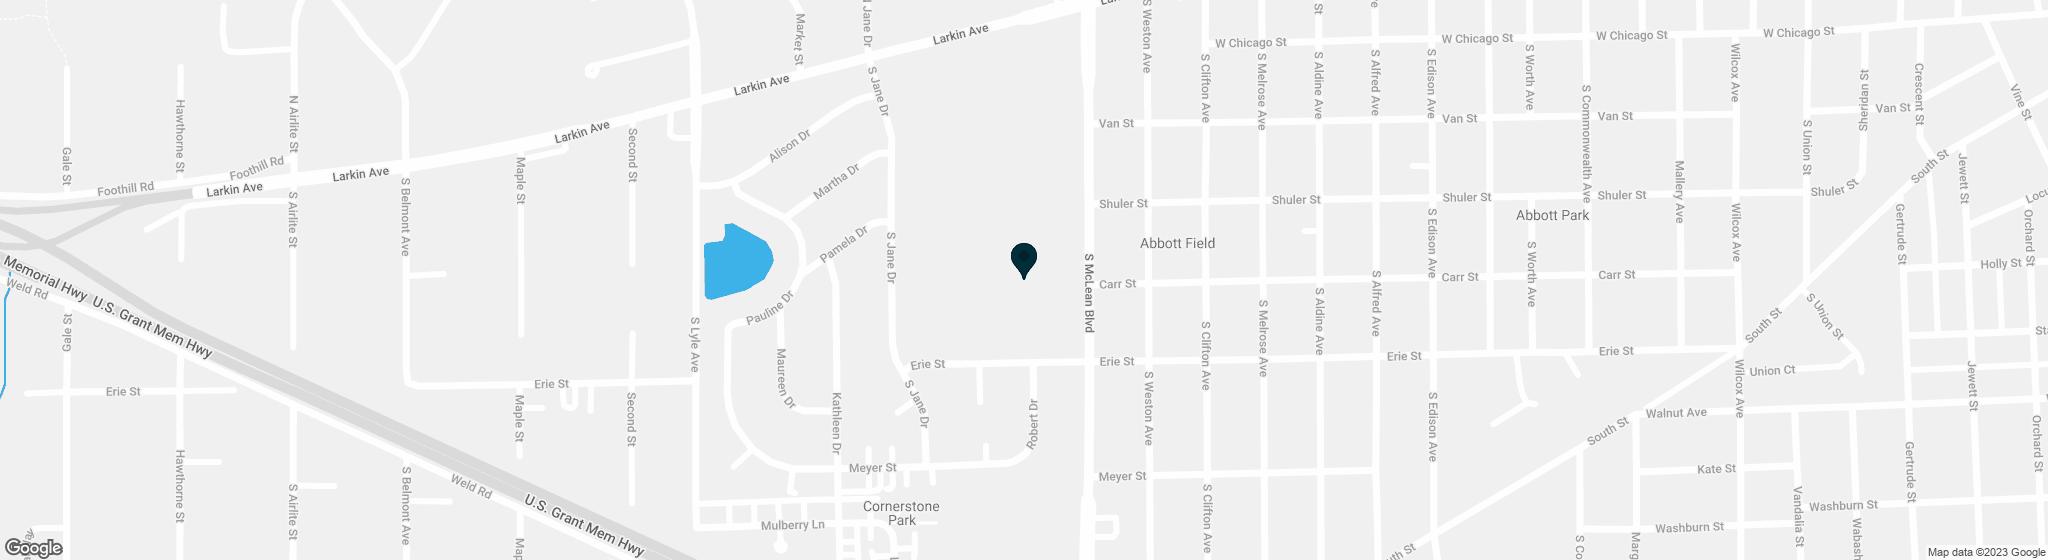 40 Acres Randall Road Elgin IL 60123